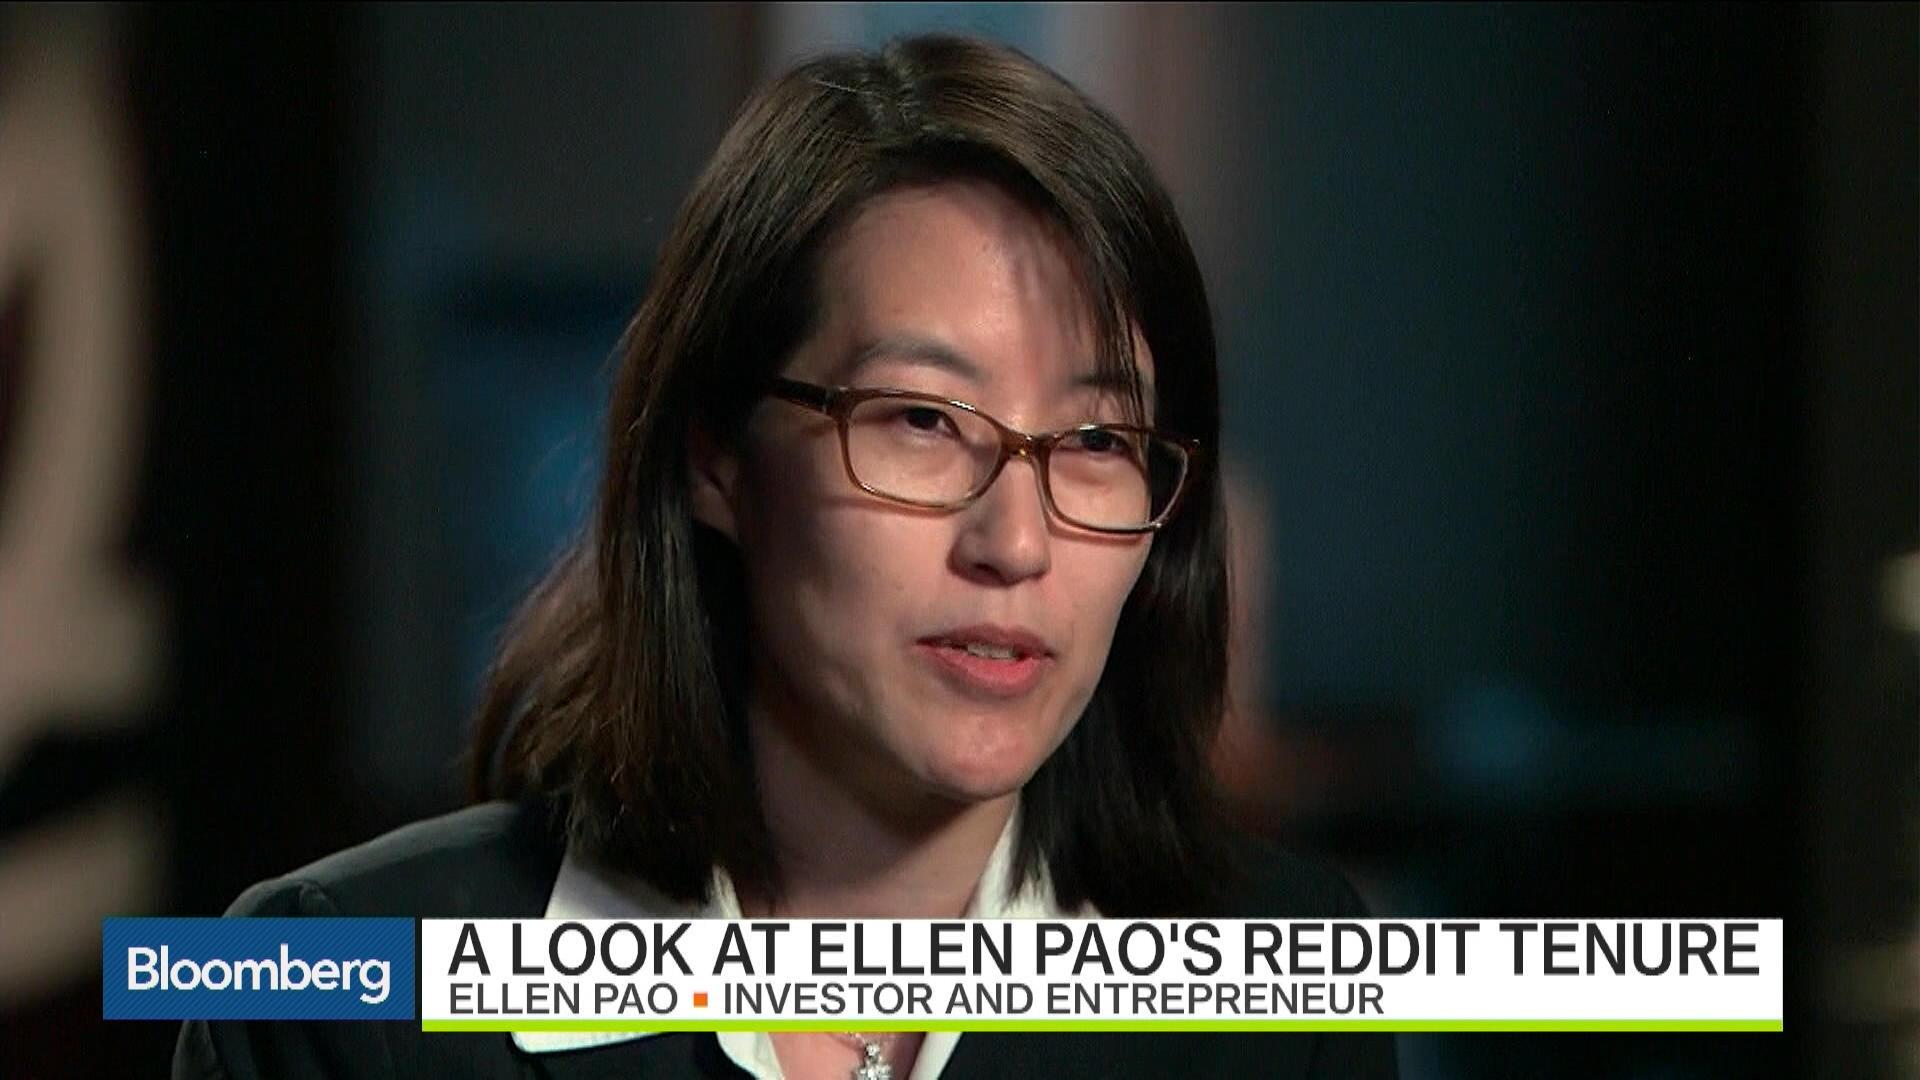 Ellen Pao Reflects on Her Tenure at Reddit